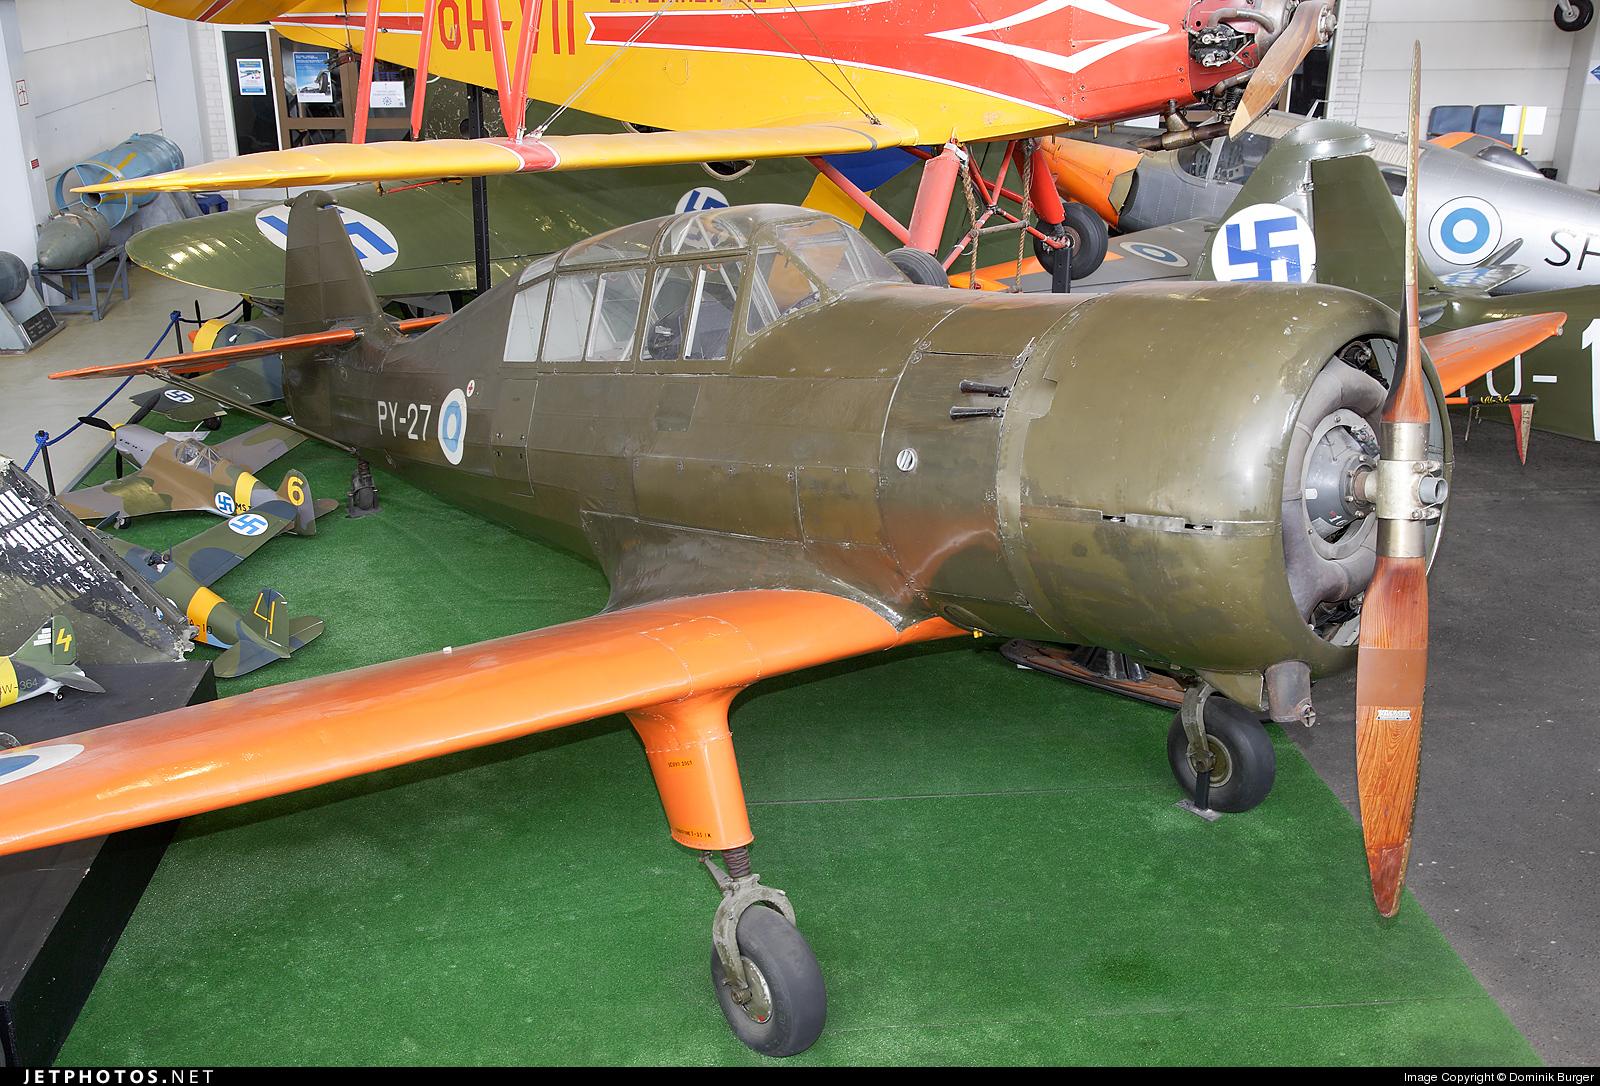 PY-27 - VL Pyry II - Finland - Air Force